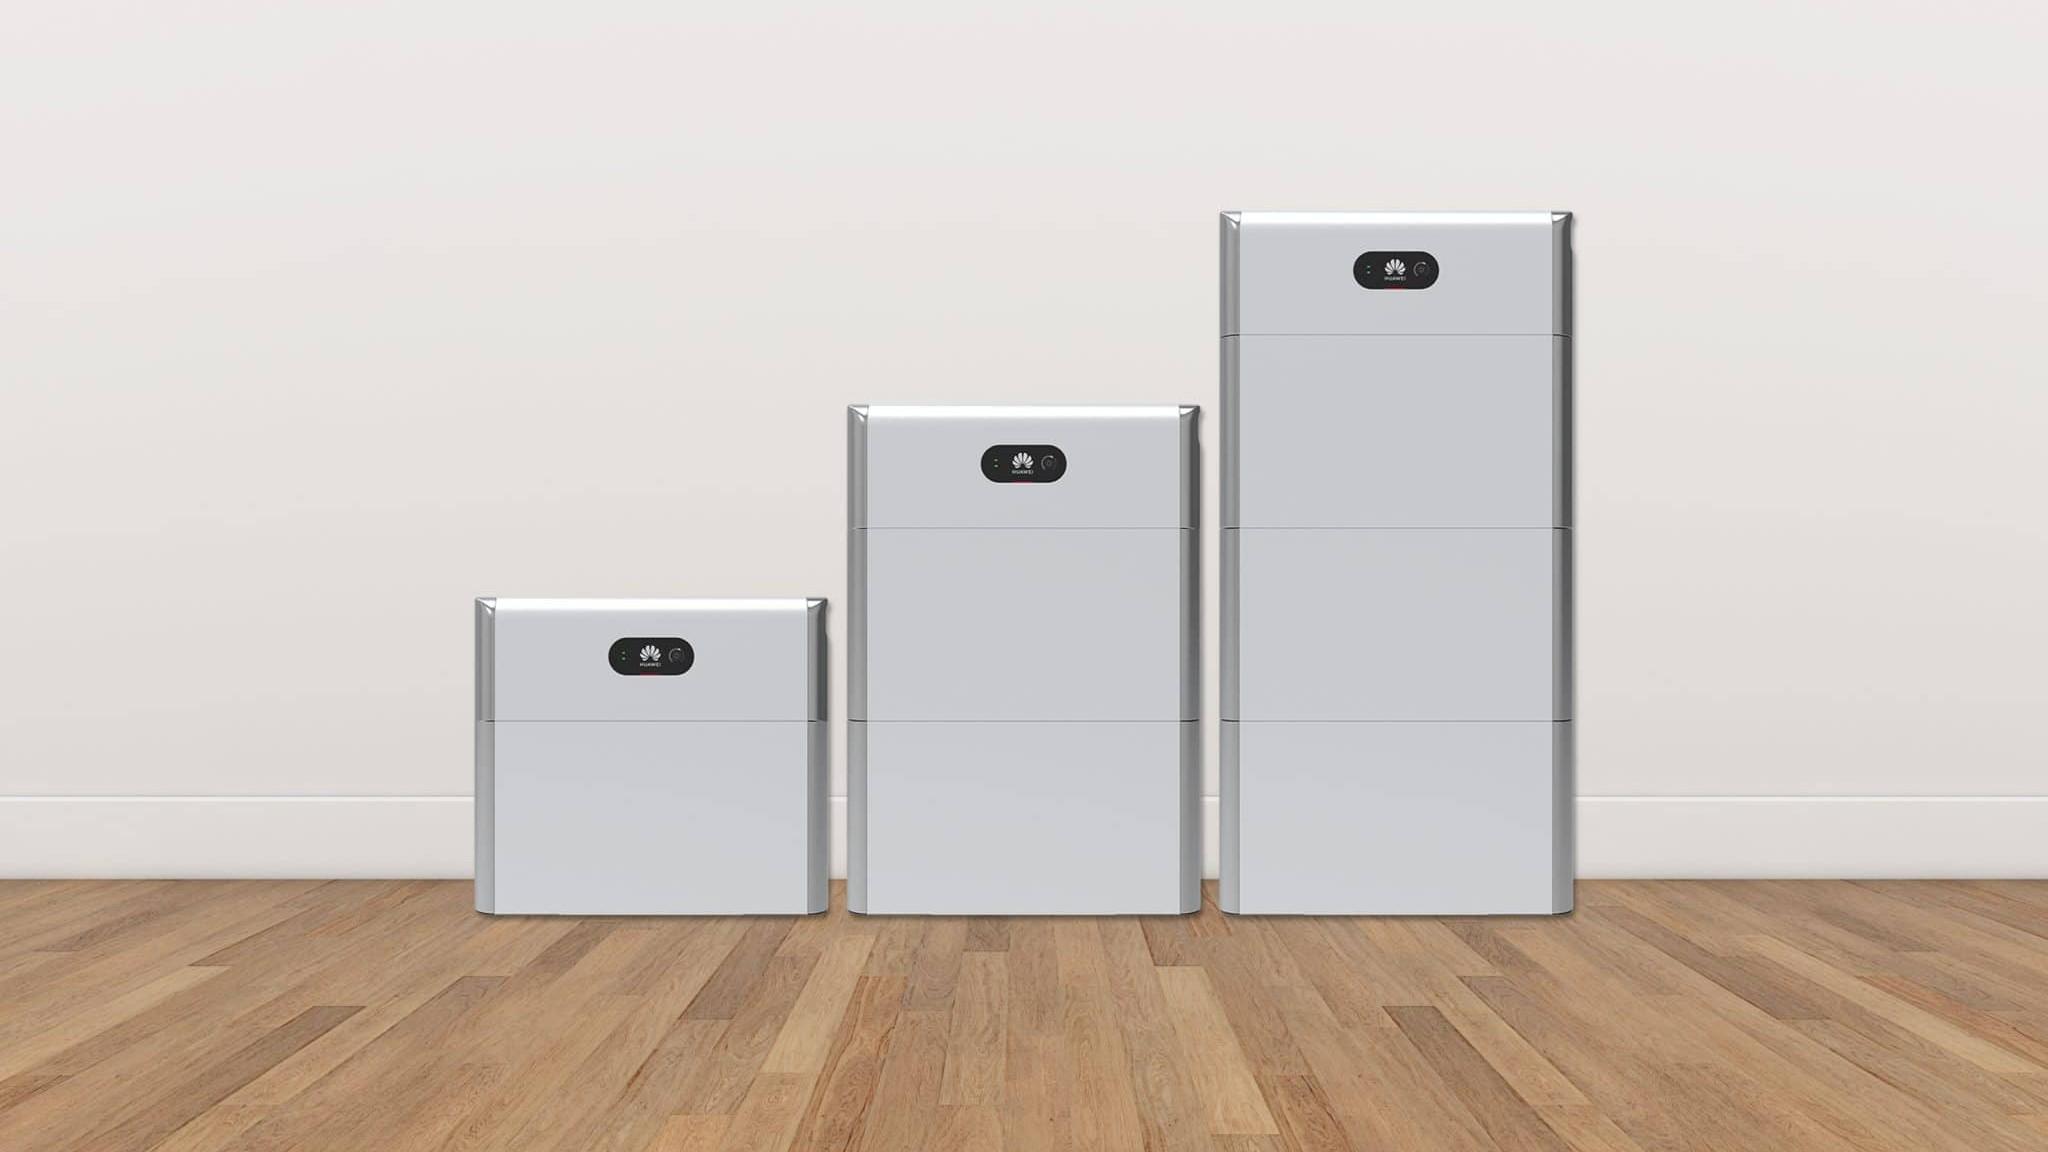 Green House Solutions zonnepanelen batterijopslag laadpalen airconditioning SUN2000L 2 5KTL sq Luna Front Overview